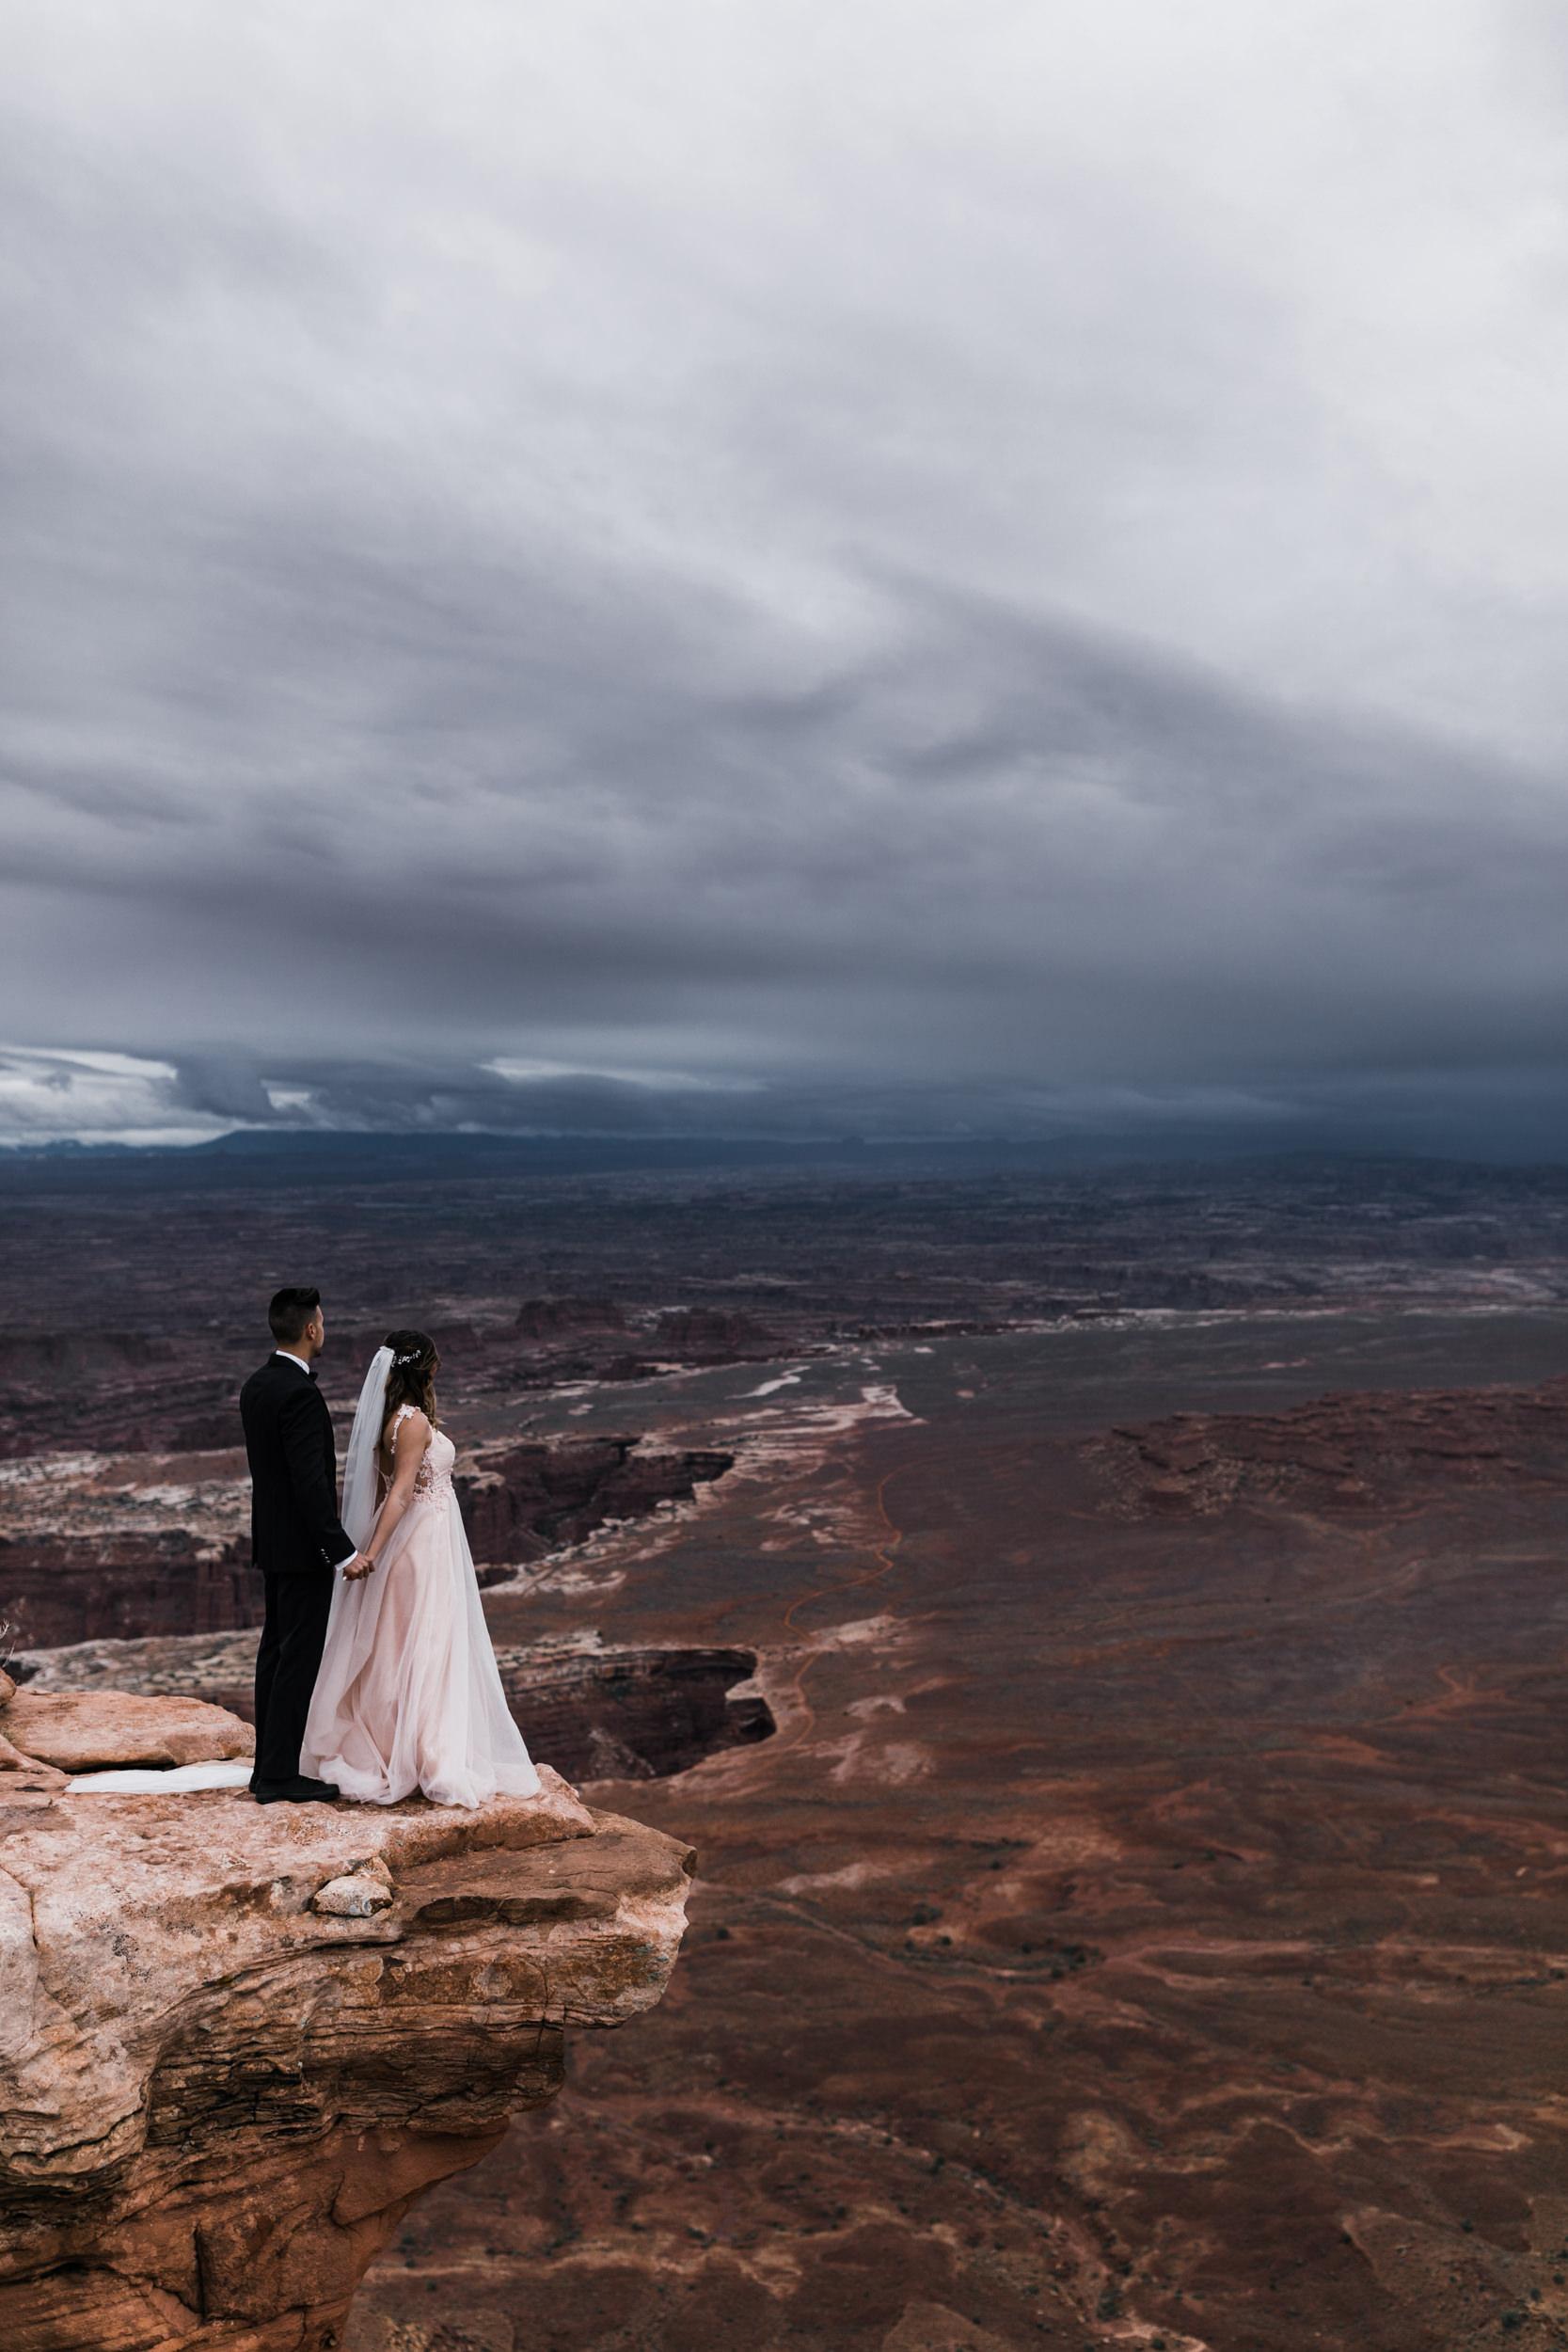 Hearnes-Elopement-Photography-Canyonlands-National-Park-Moab-Wedding-19.jpg